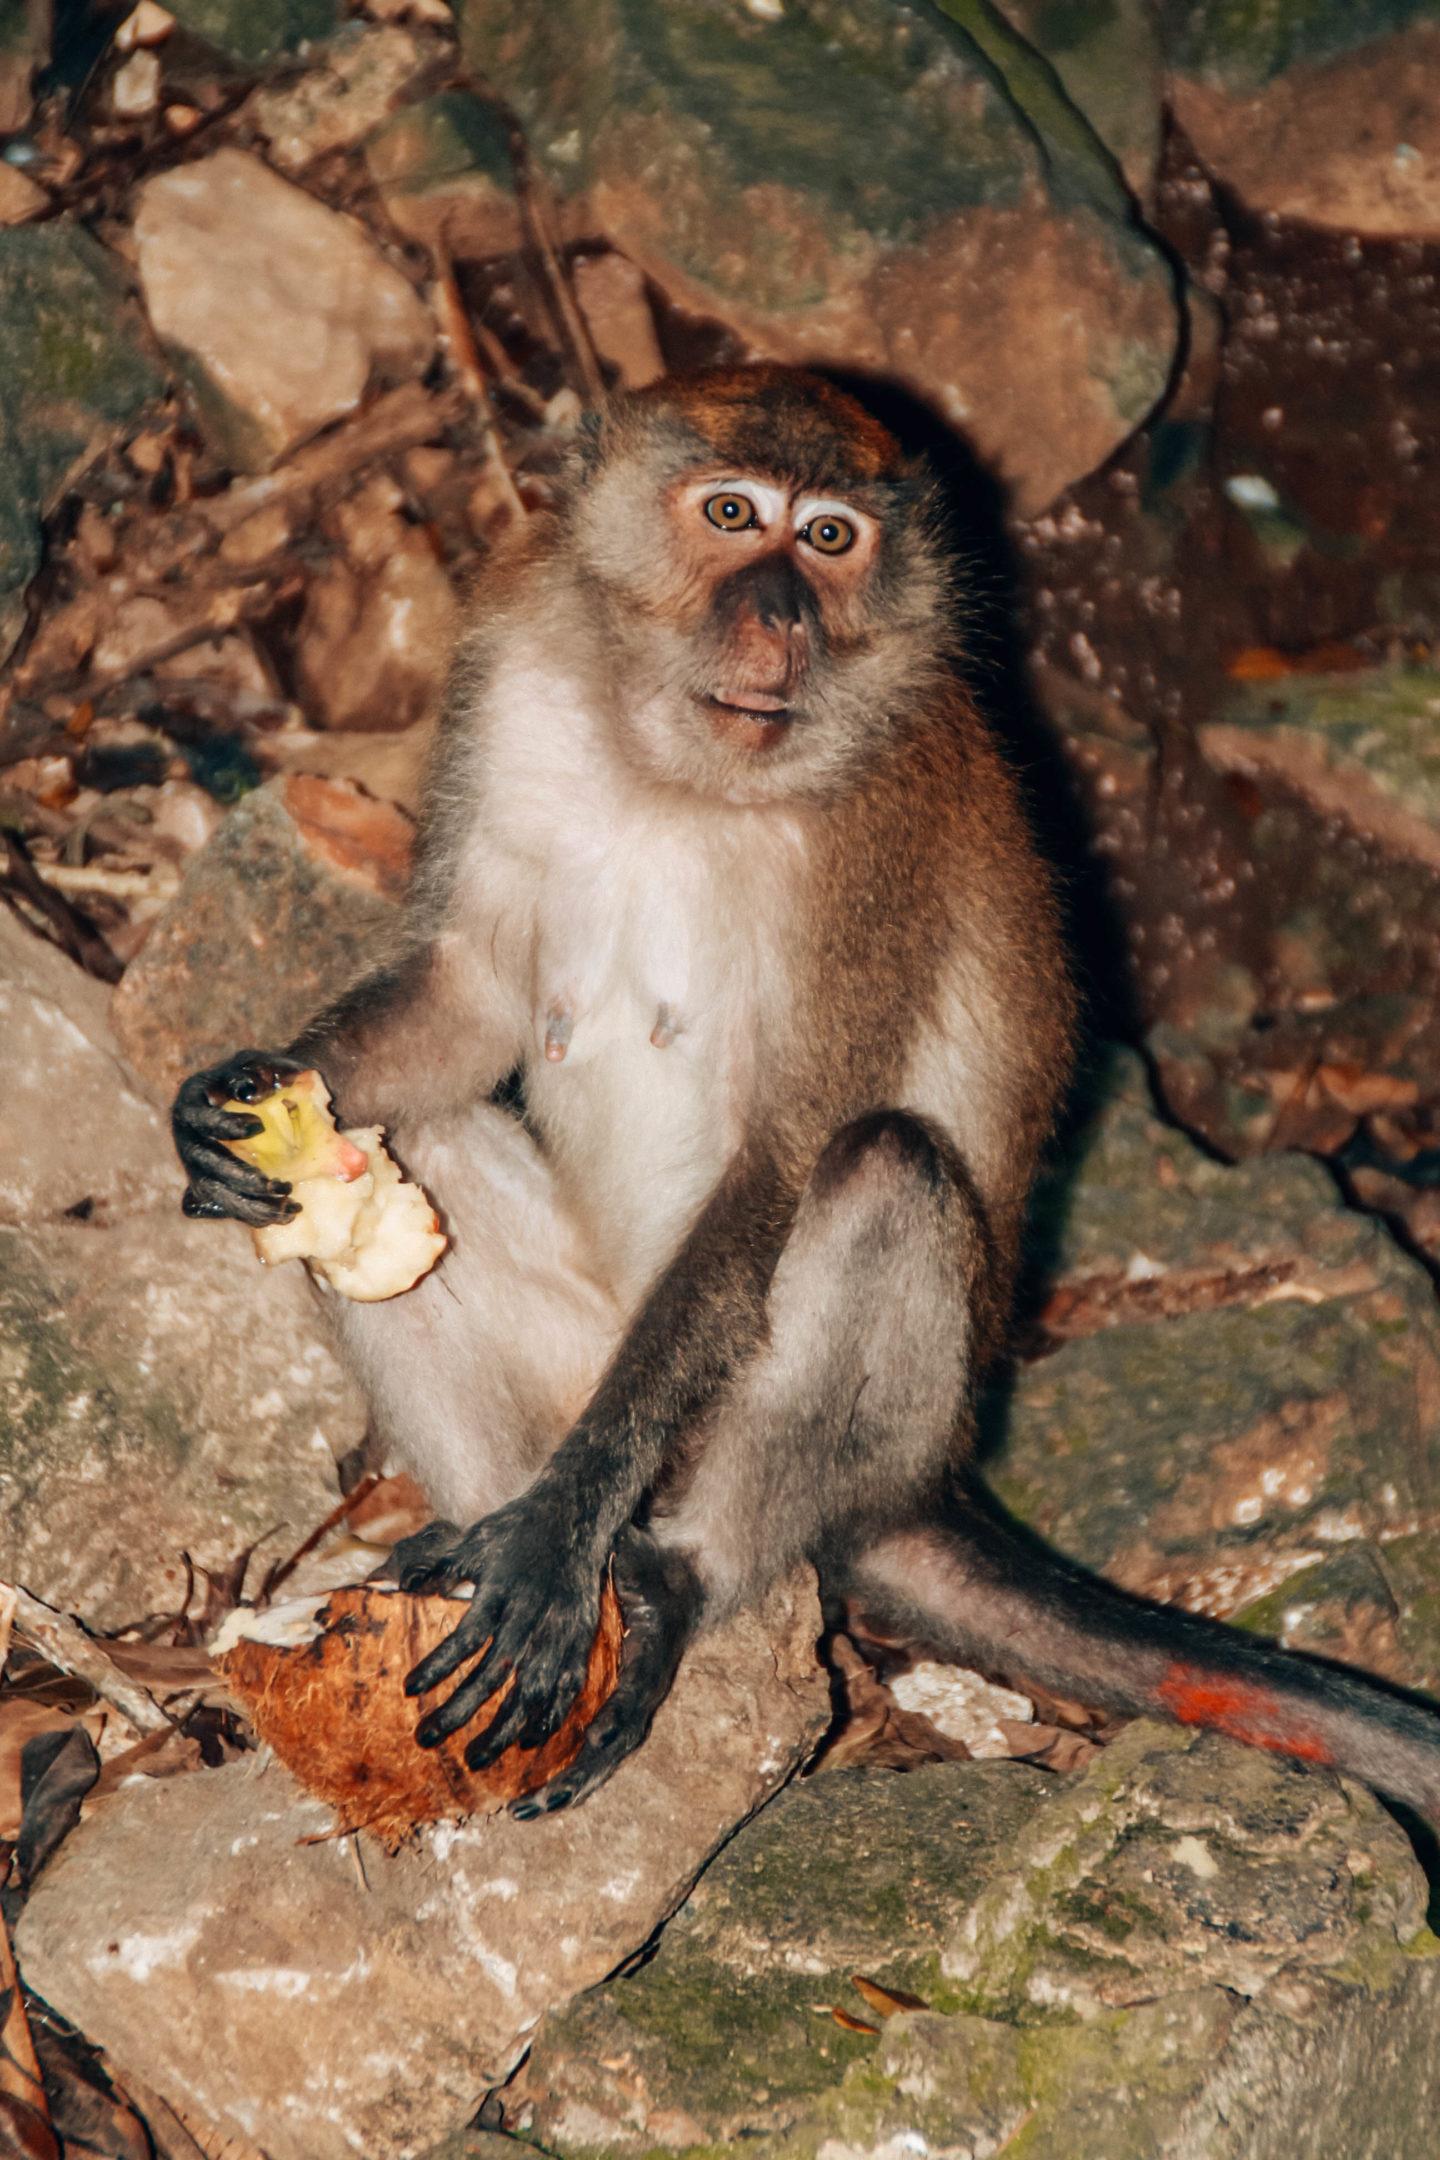 Wild monkey in the Batu Caves Kuala Lumpur